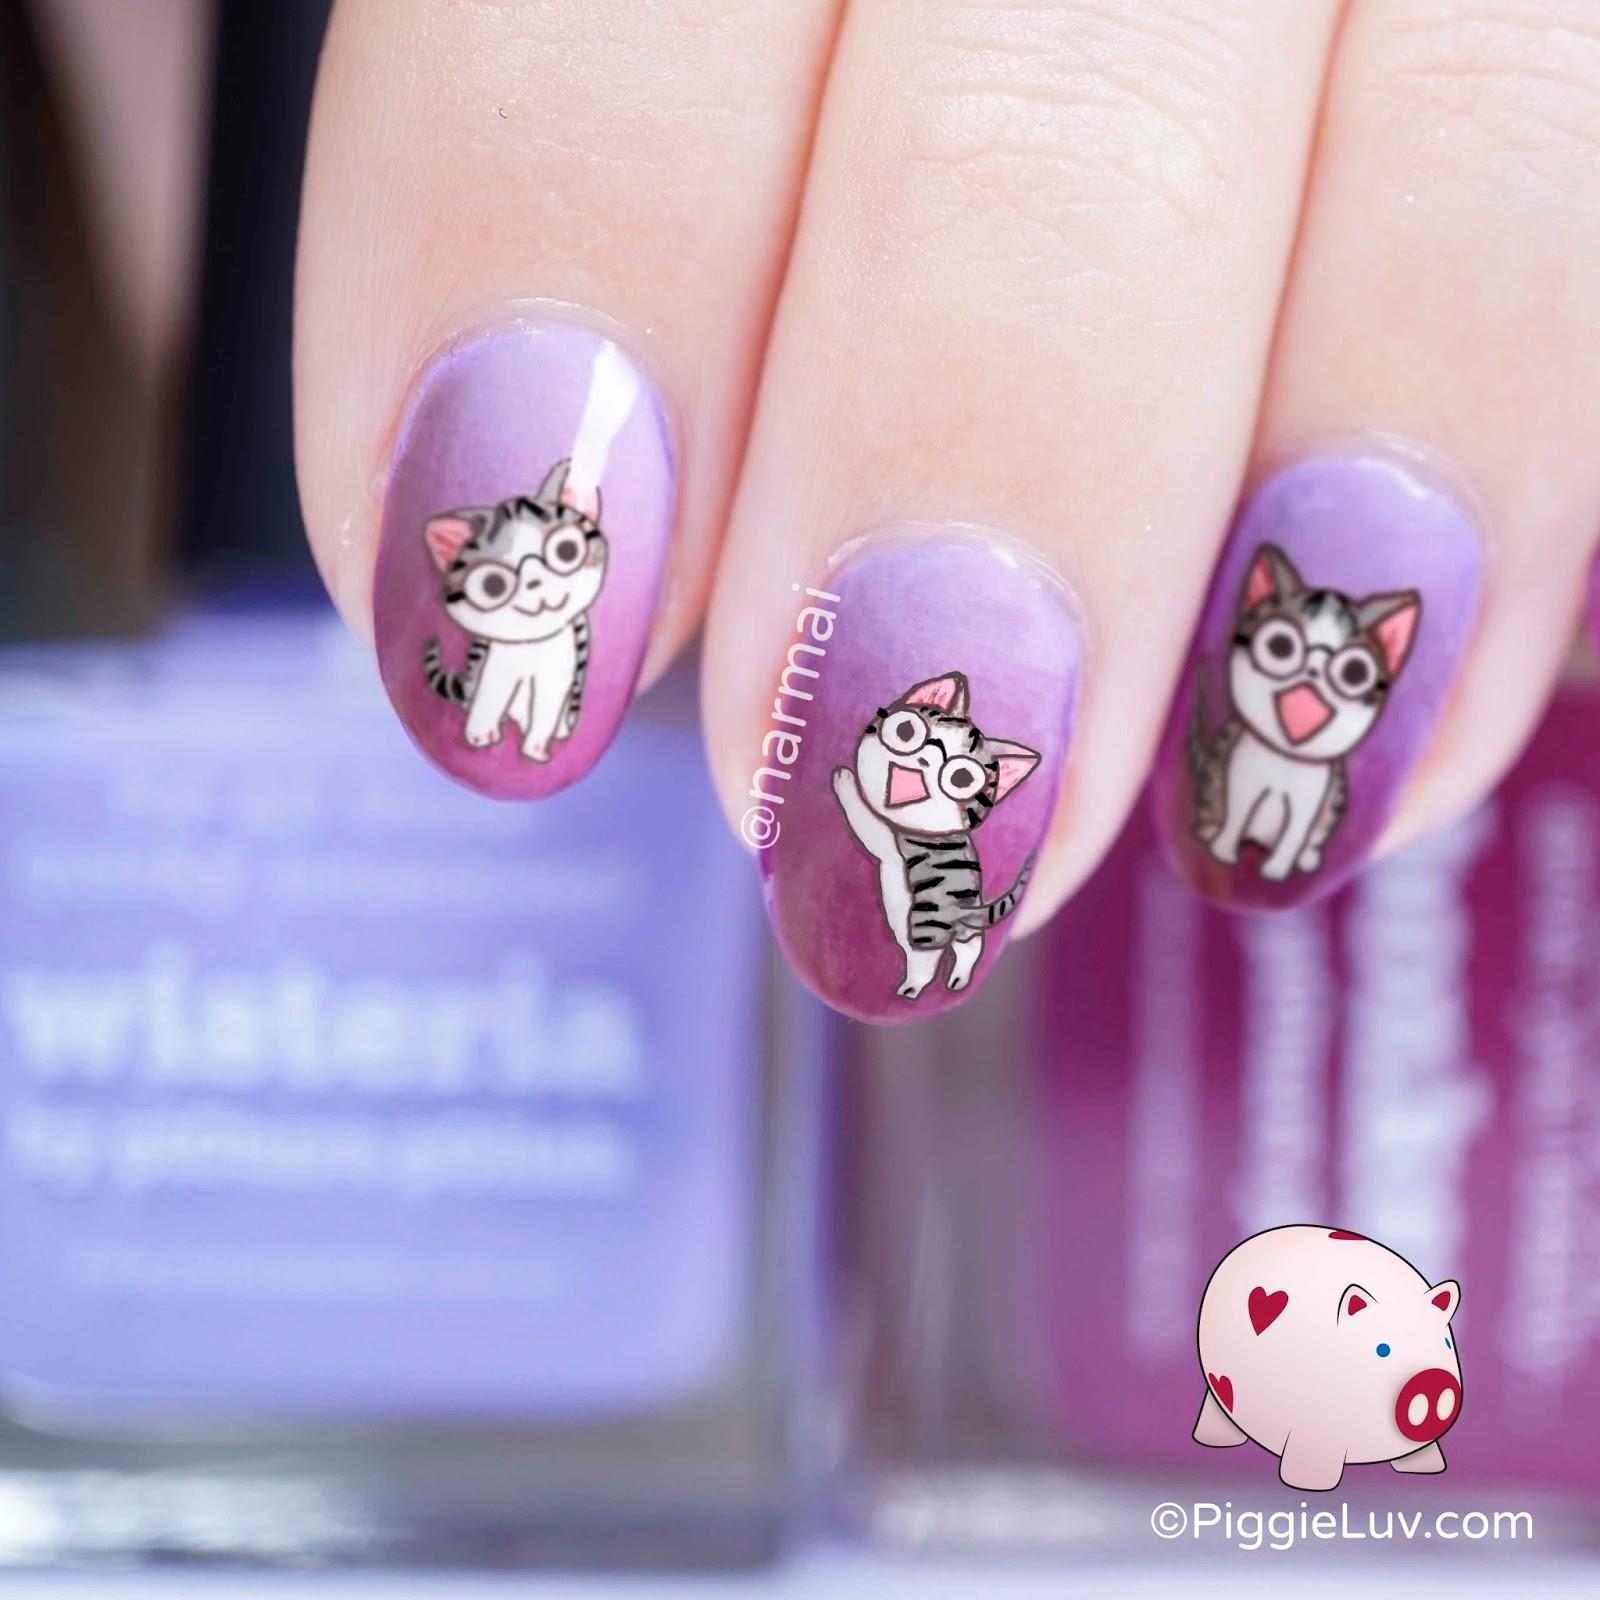 PiggieLuv: Nerdy cats nail art